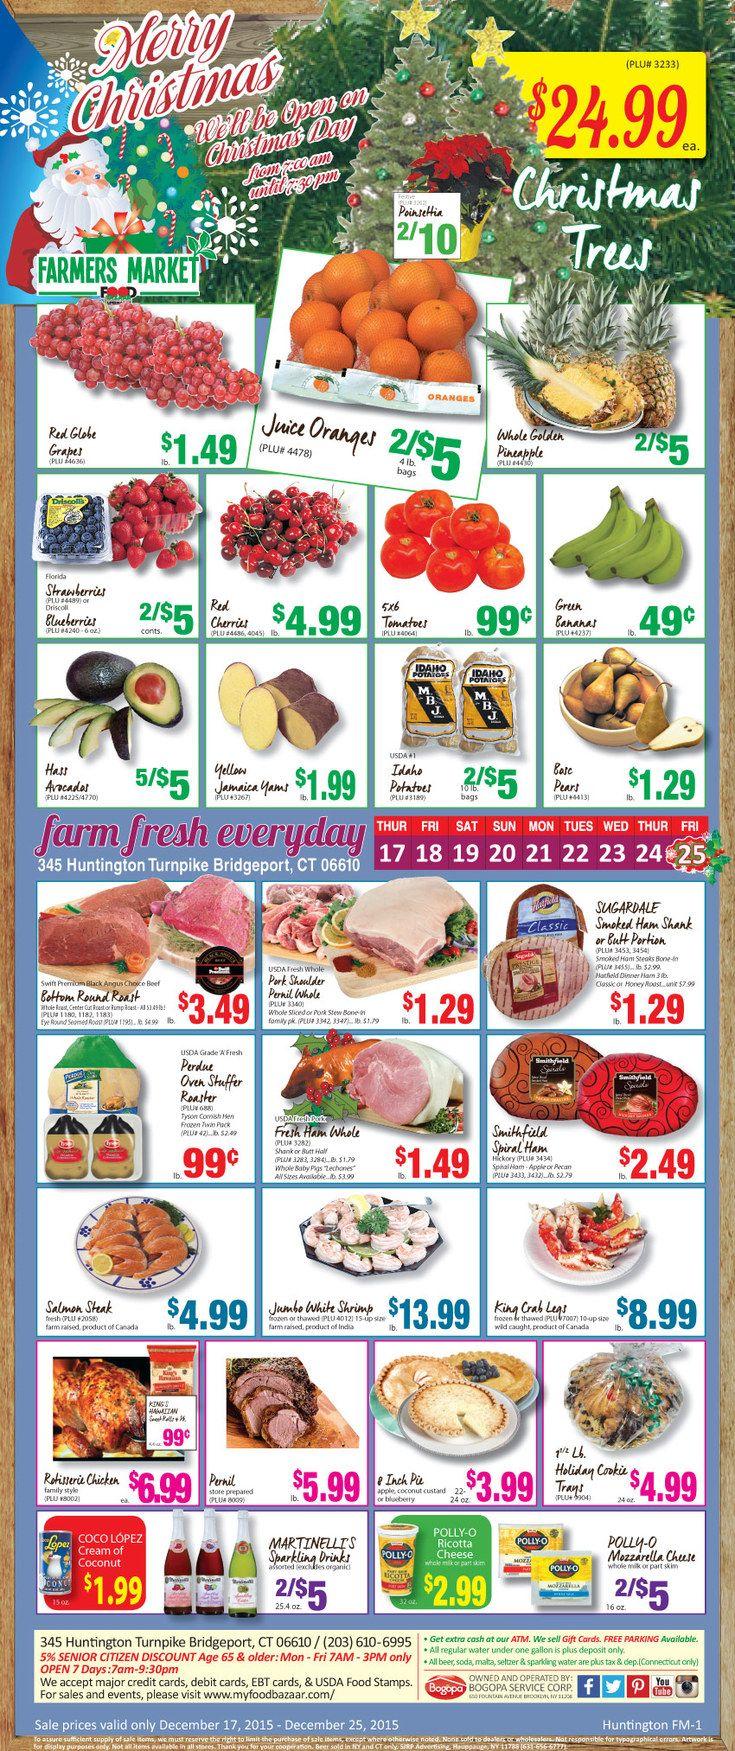 Food bazaar circular dec 10 dec 16 2015 kaitalog